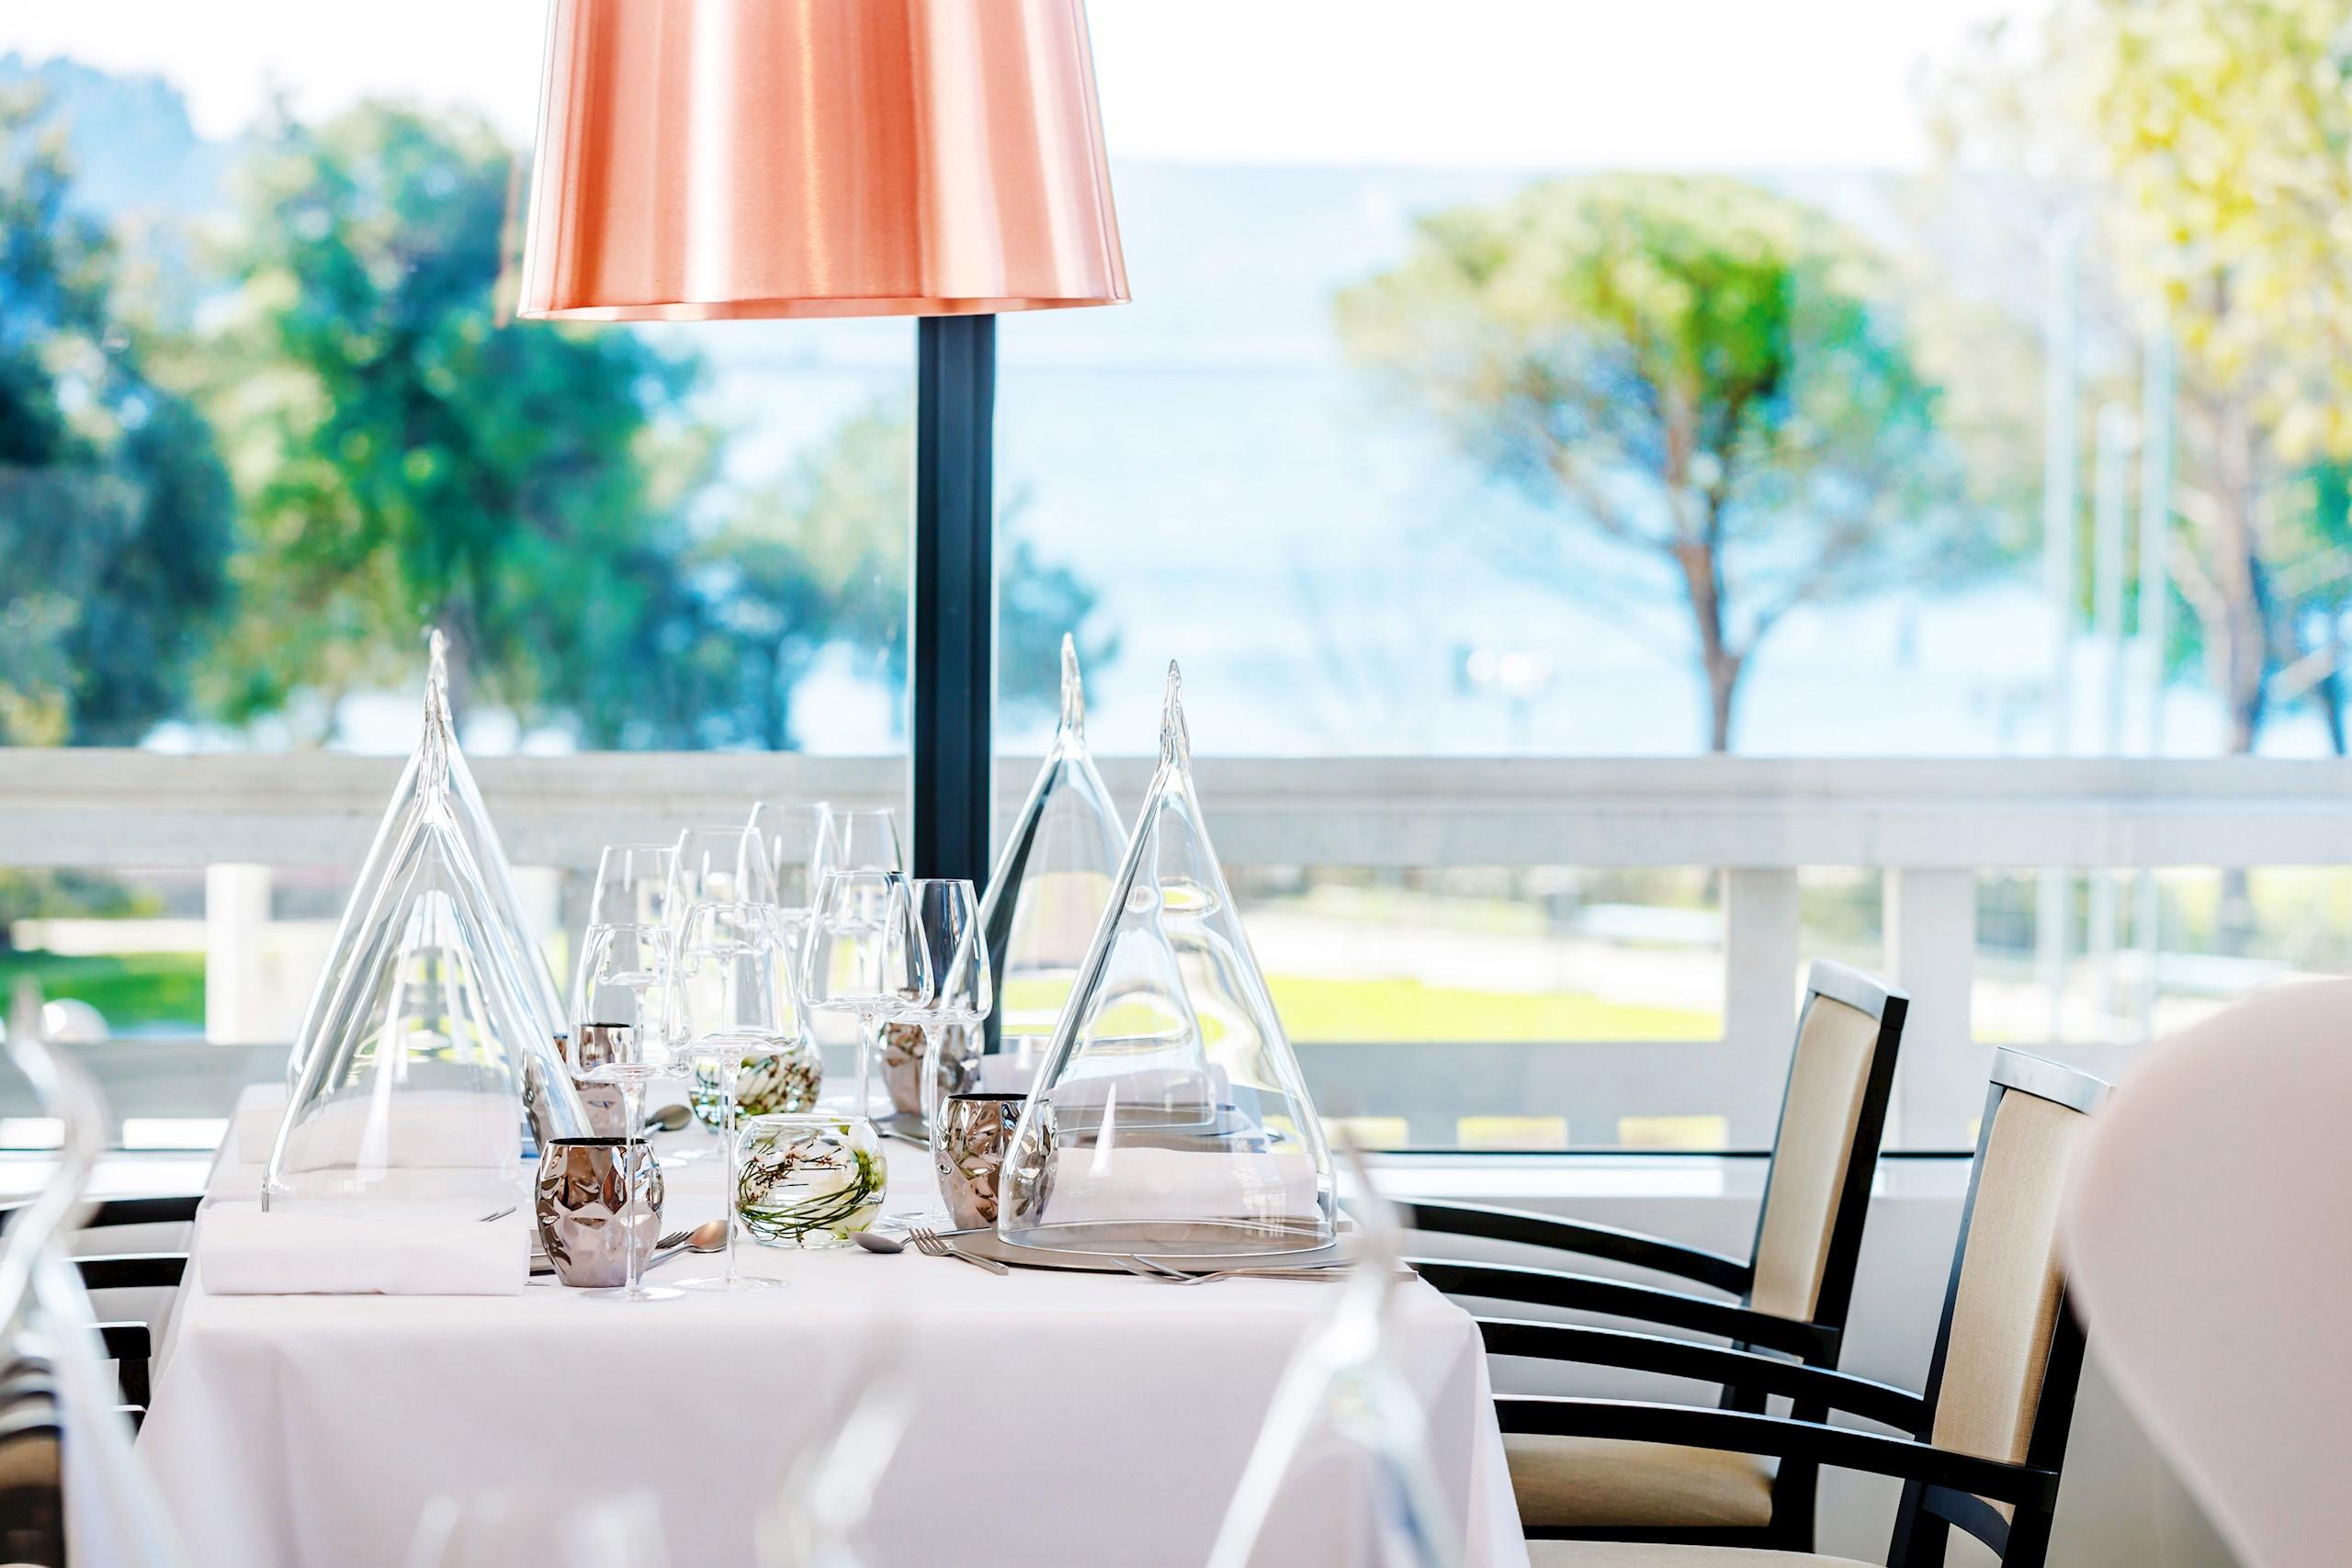 restaurant-salina-ready-tabel-chiars-window-sea-view-trees